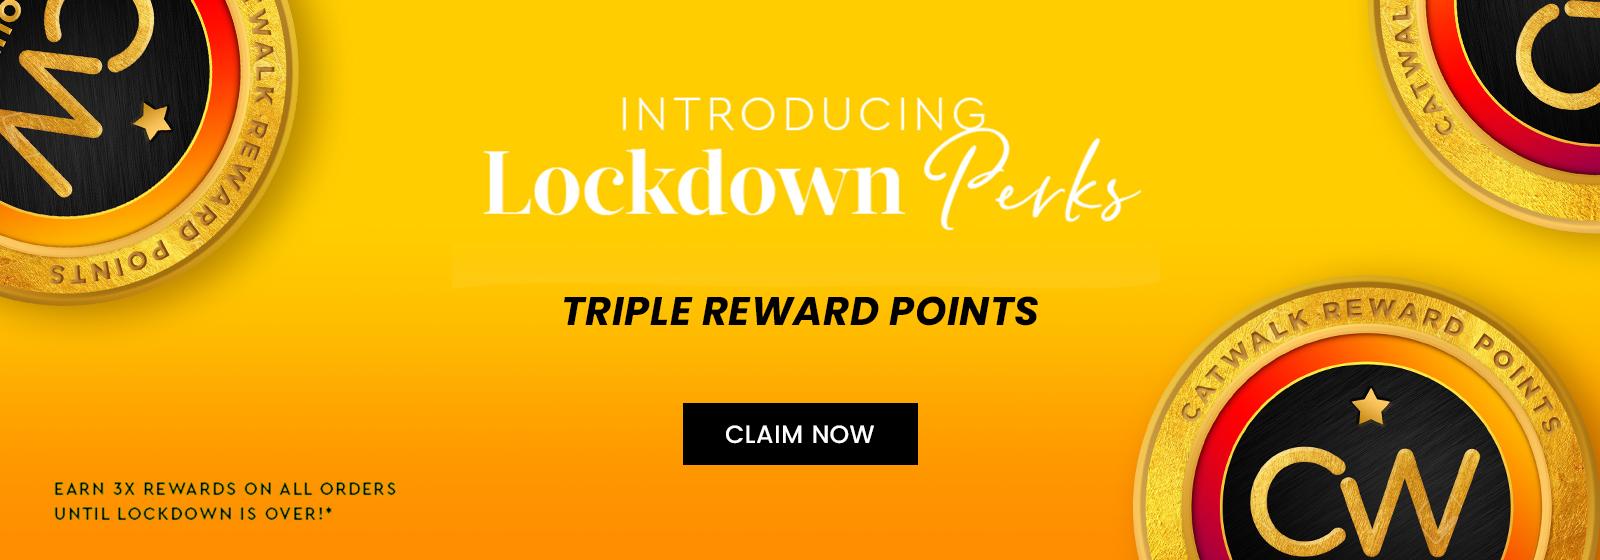 triple reward points